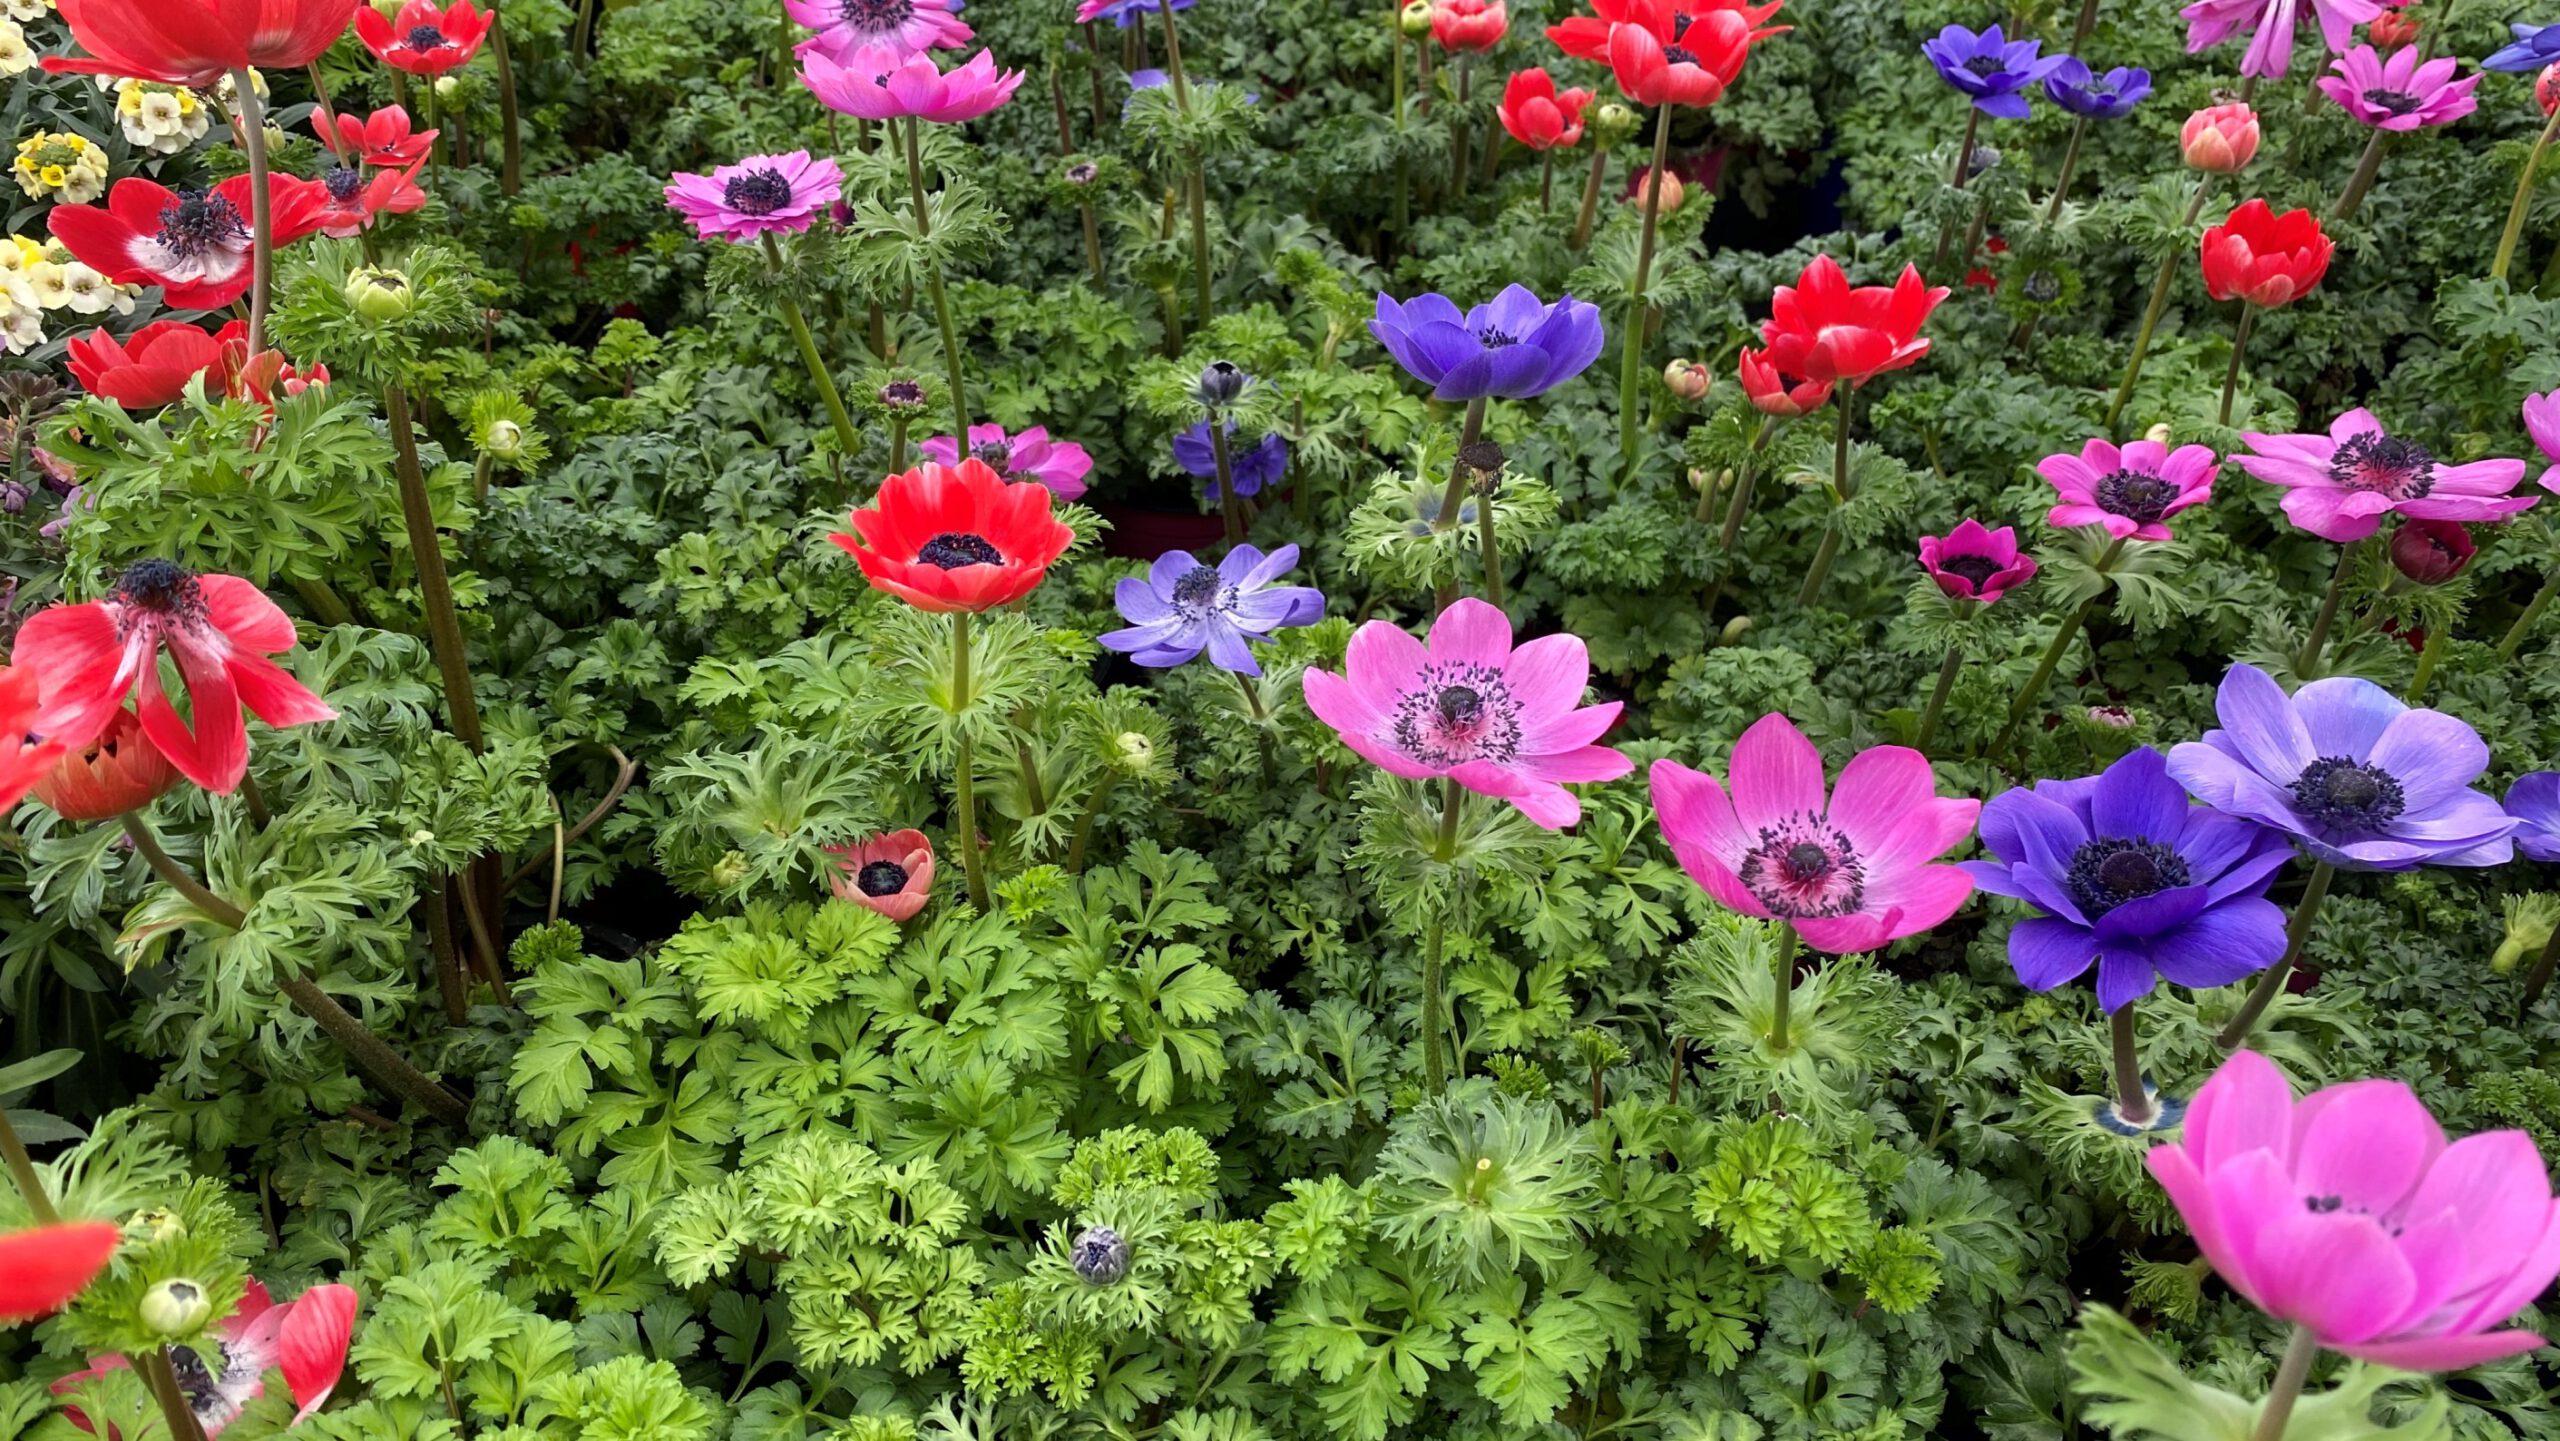 Kronen-Anemone - Blütengruppe